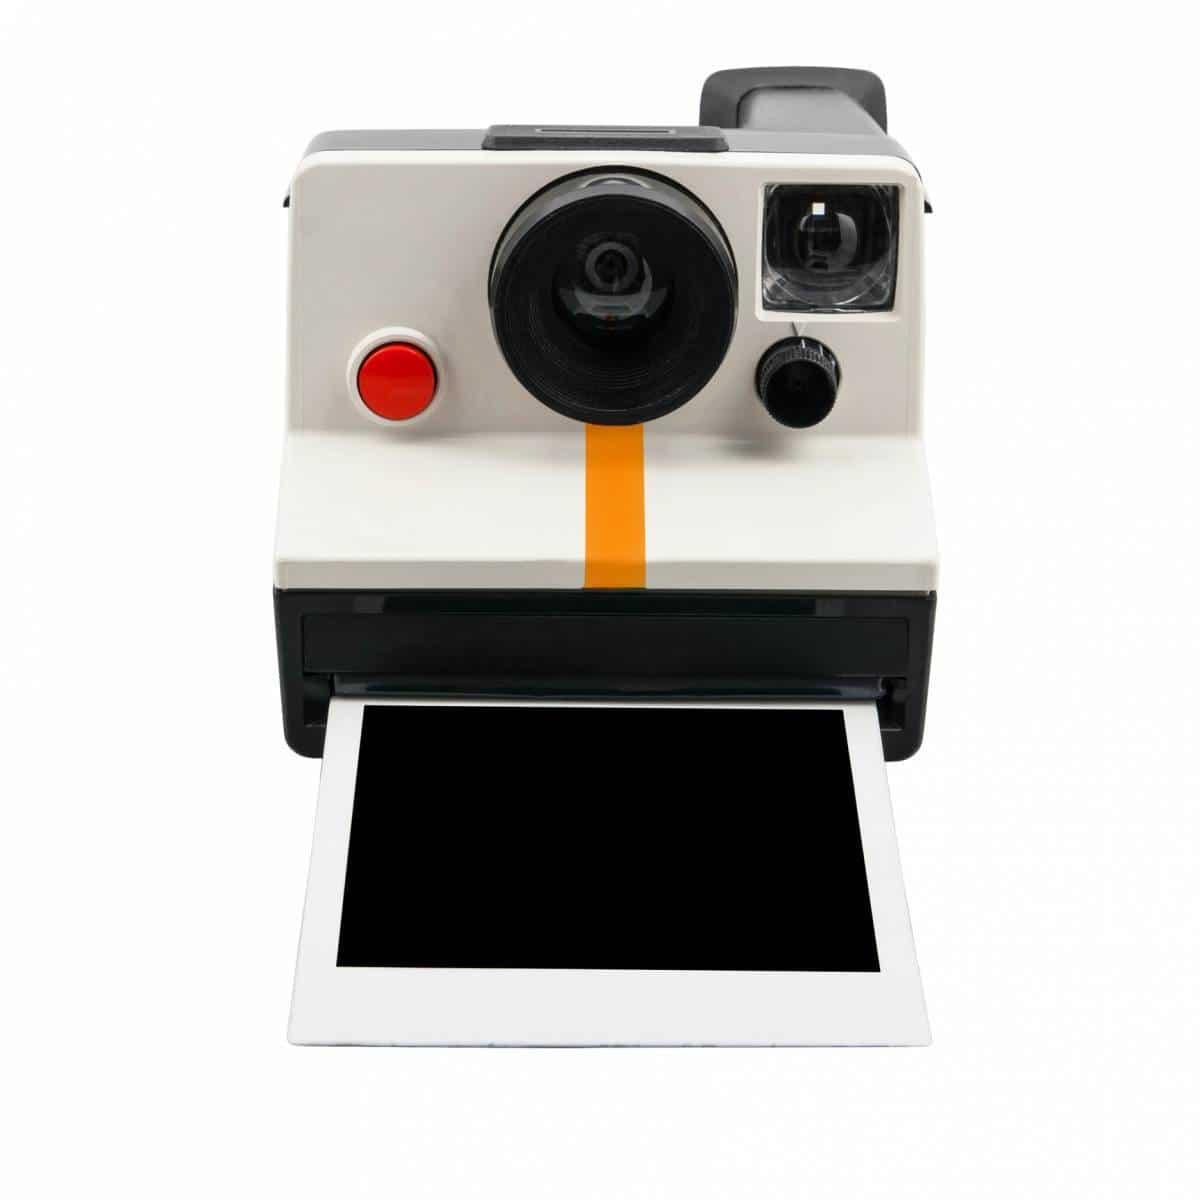 picture polaroid marque - Polaroid, une grande marque de la photo qui évolue avec son temps